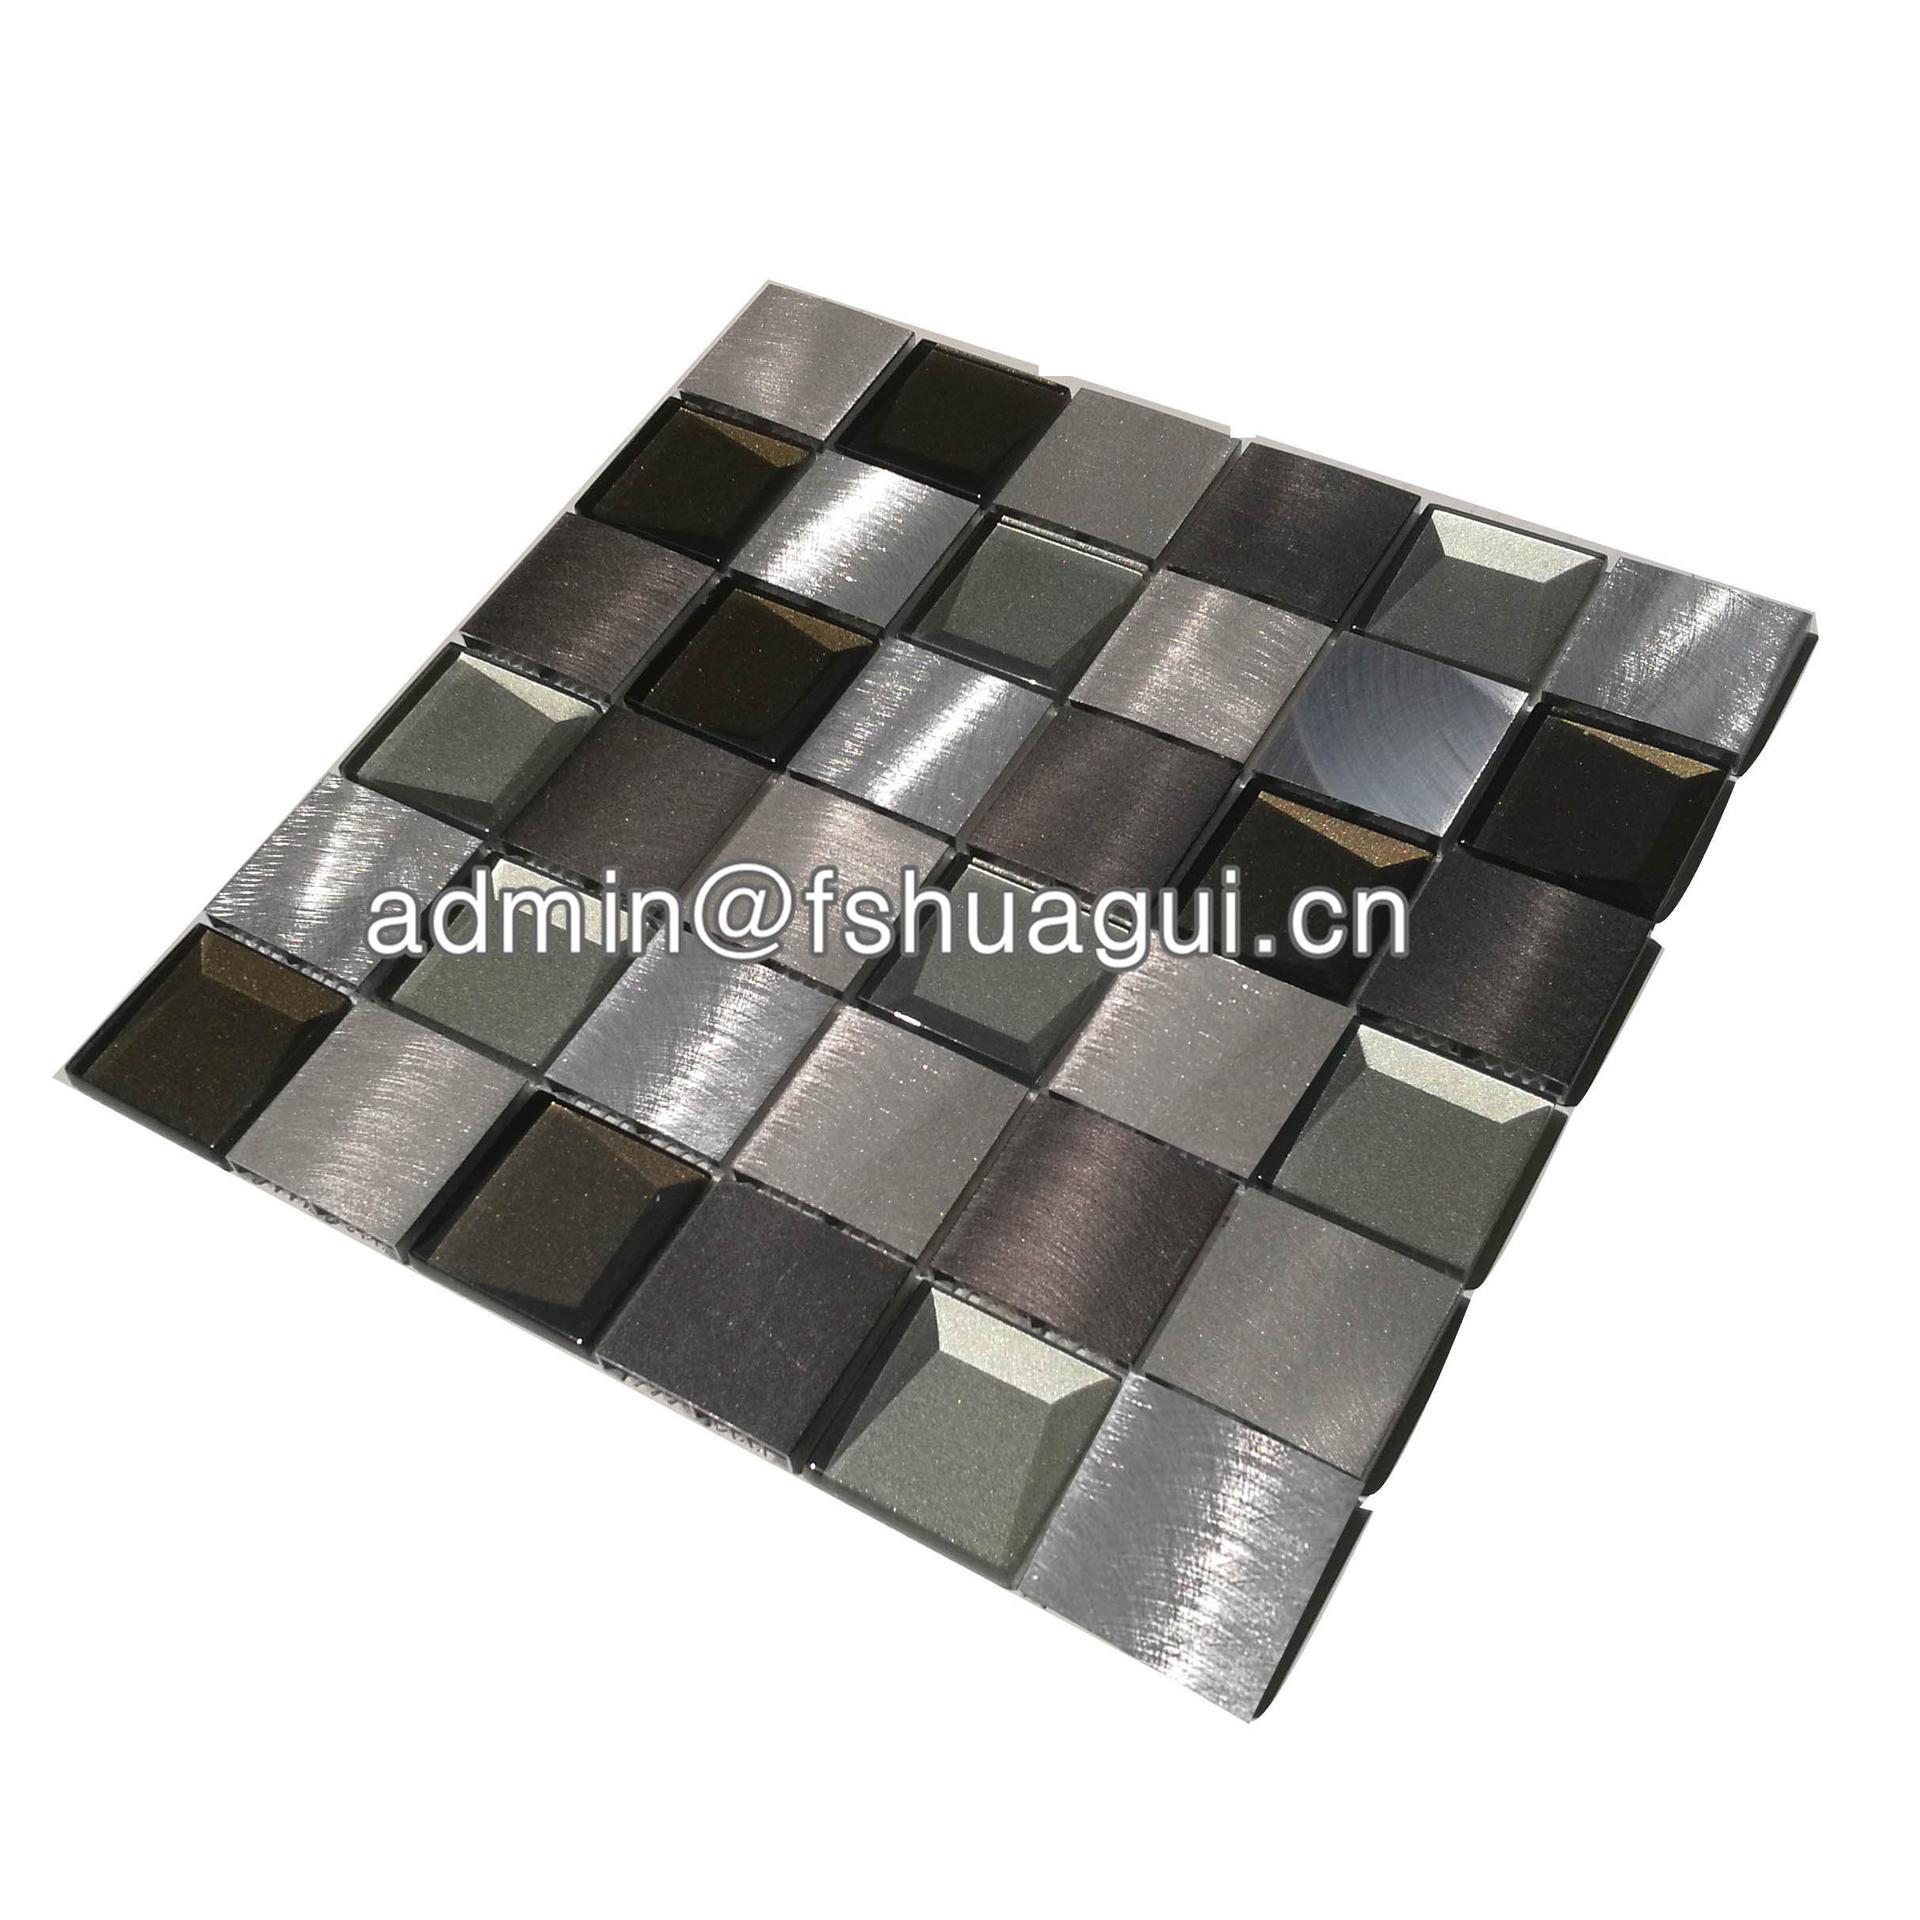 Unique 3d tiles black and silver glass mosaic kitchen tile backsplash 2018 HG-WJ416